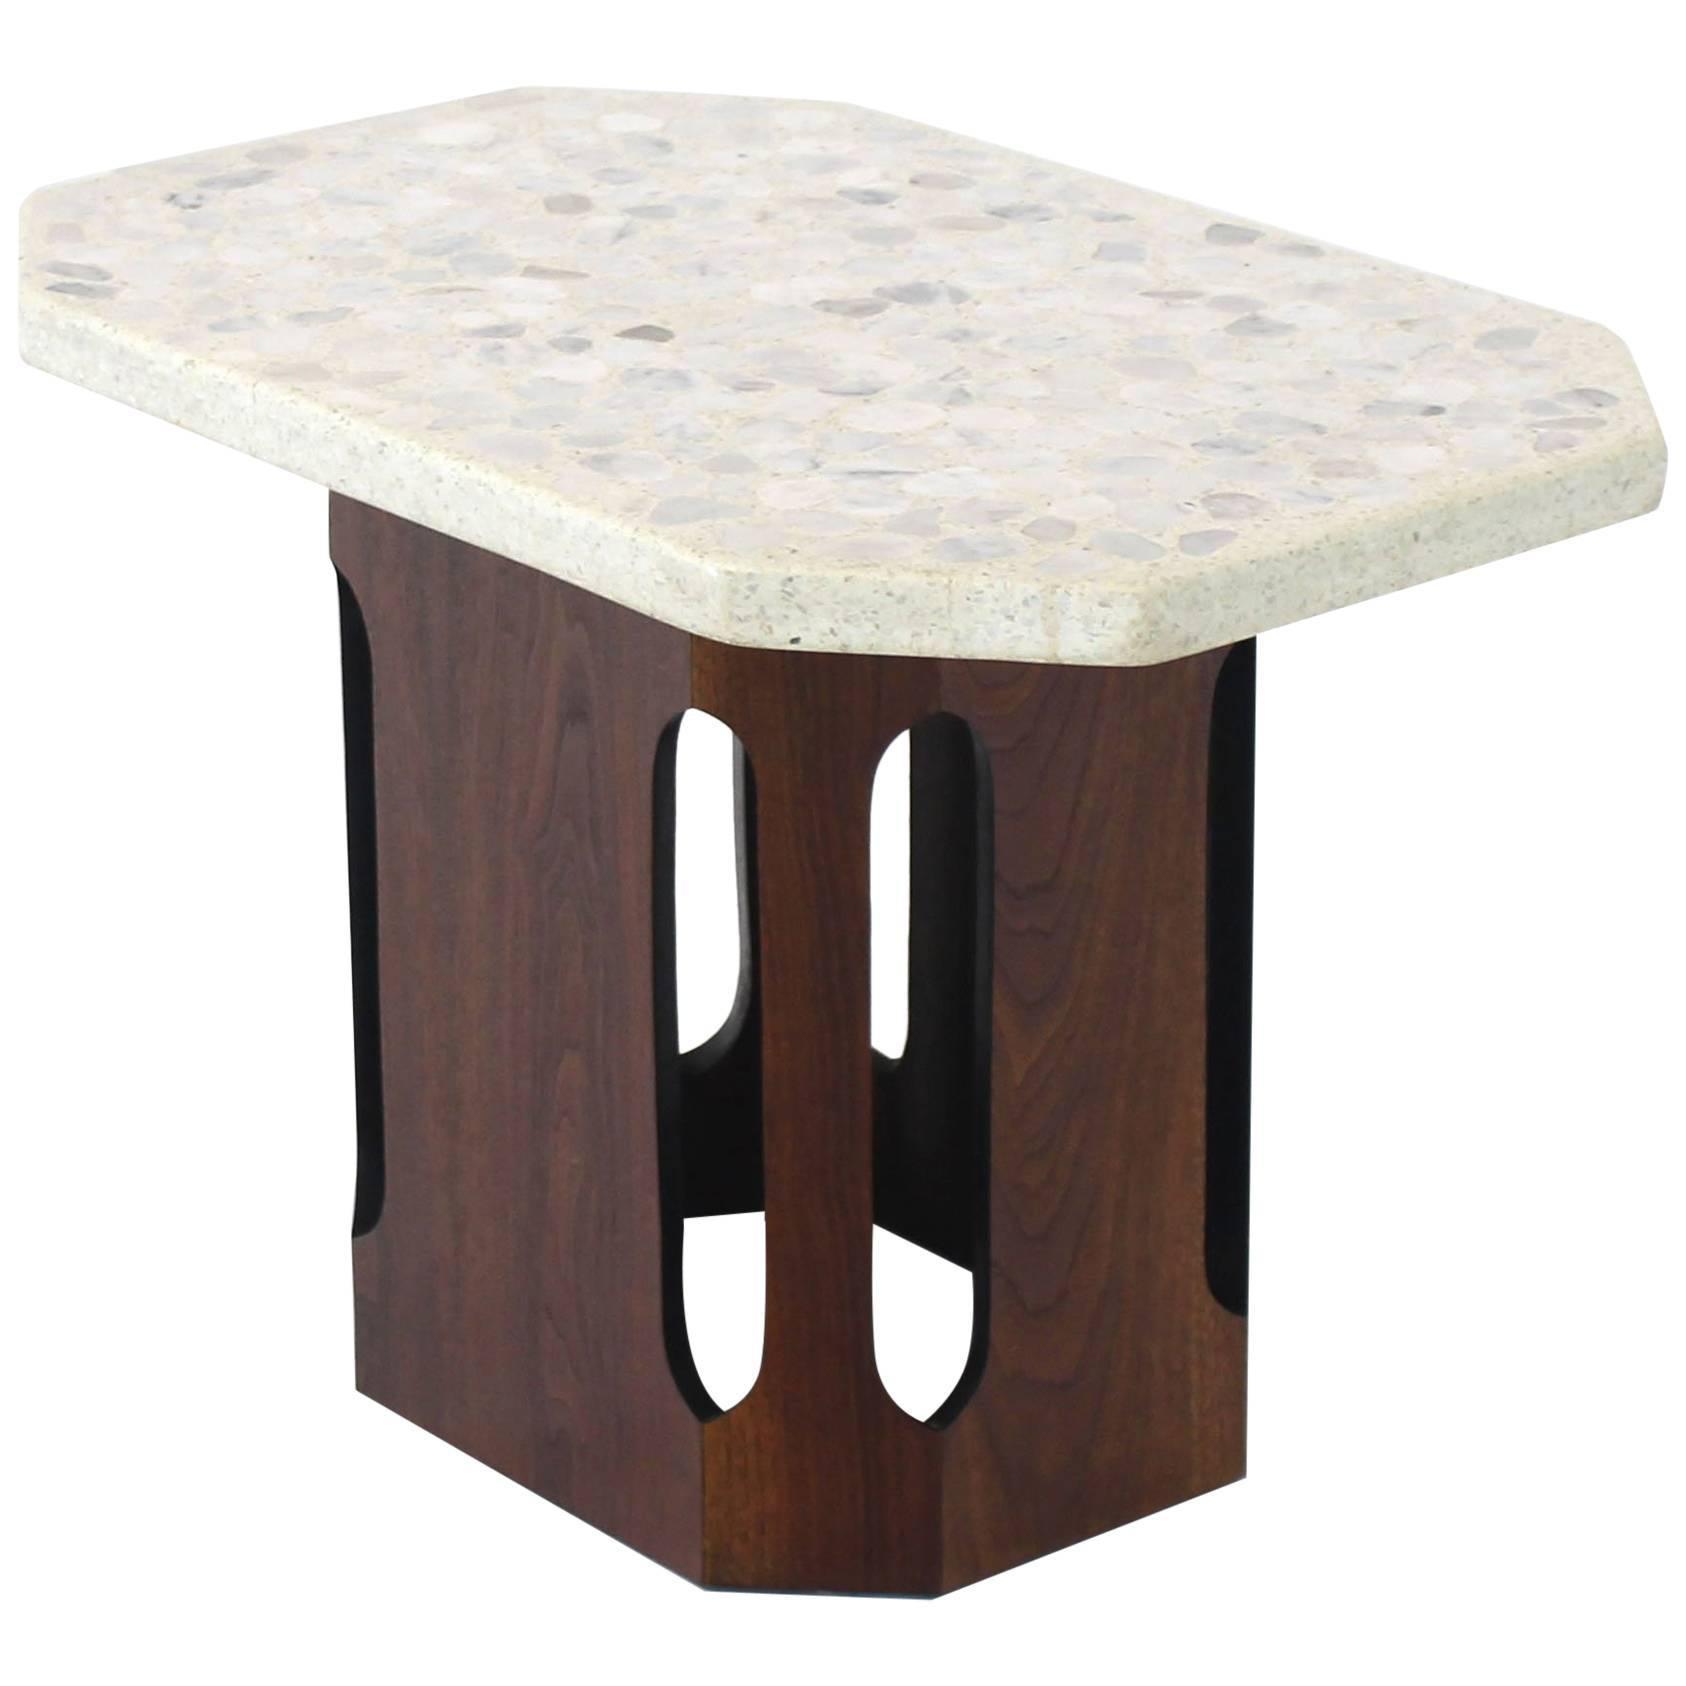 Oiled Walnut Base Terrazzo Top Side Table